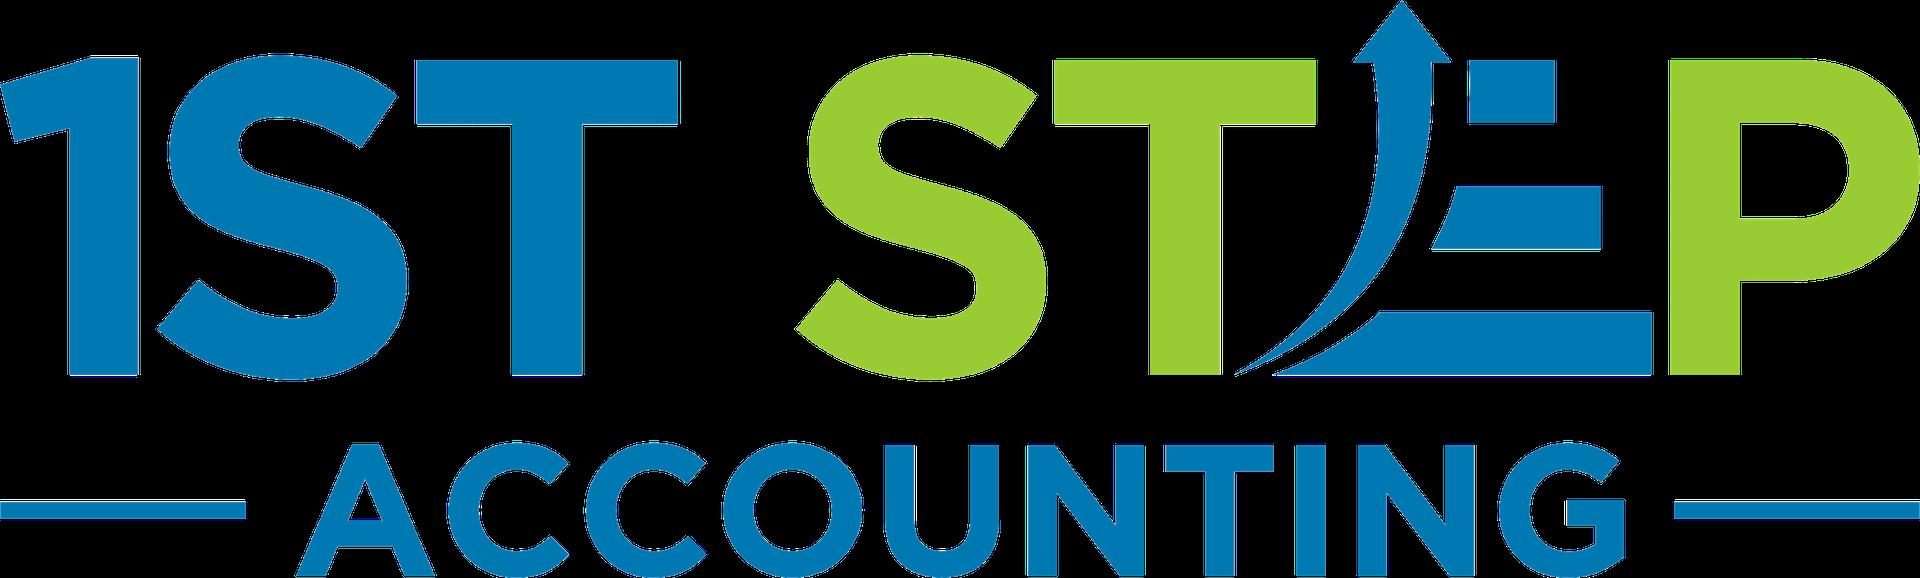 1st Step Accounting, LLC